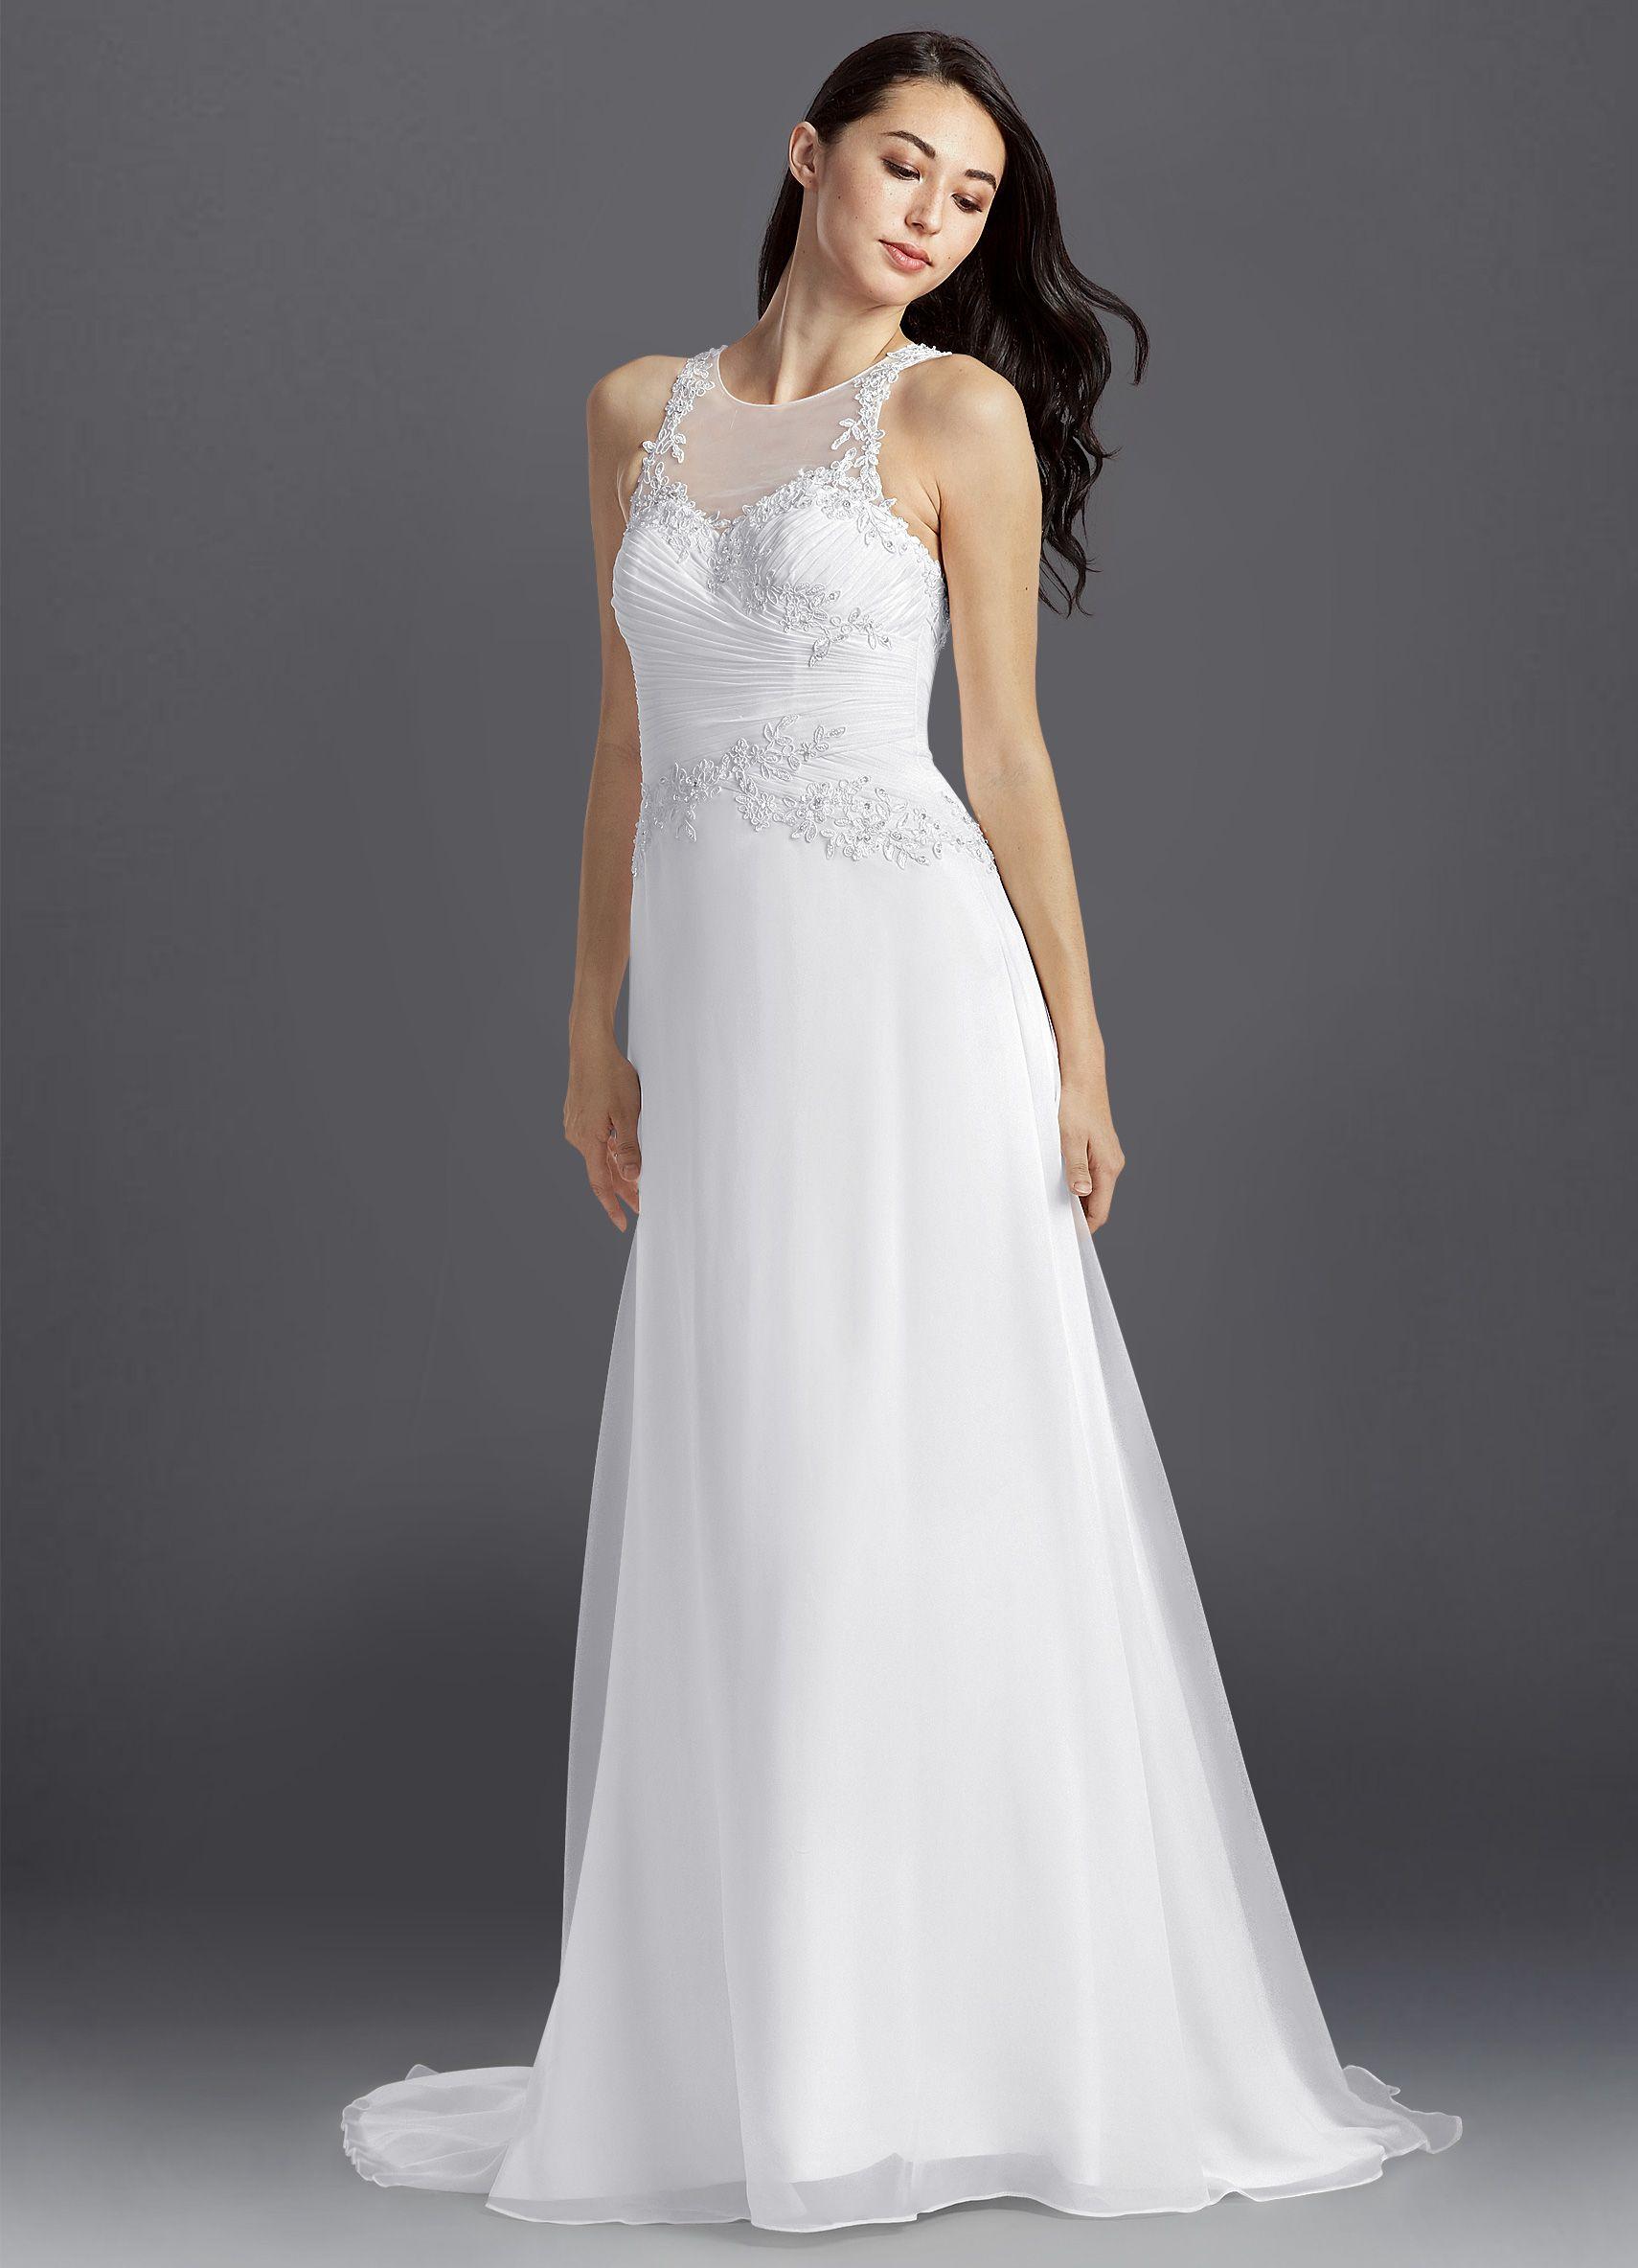 6605358a24c AZAZIE 2018 Bridal Collection  Bride  Wedding  Weddingstyle  CustomDresses    AZAZIE